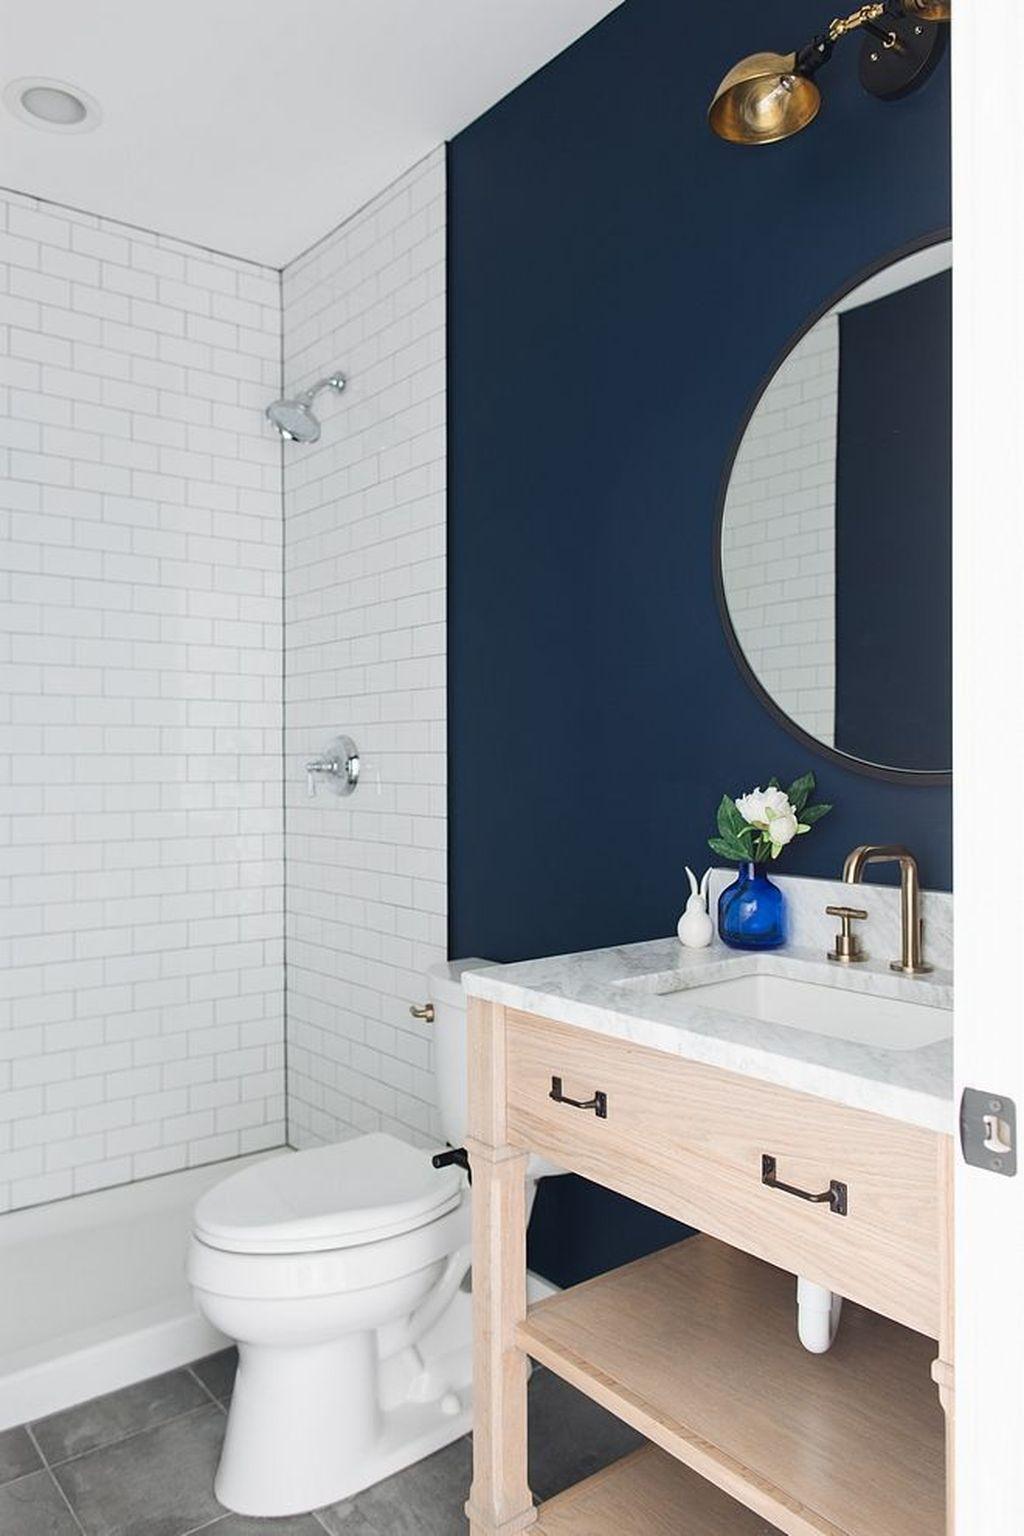 35 Fabulous Farmhouse Bathroom Wall Color Ideas Page 32 Of 38 Fathinah Decor Bathroom Wall Colors Blue Bathroom Dark Blue Bathrooms